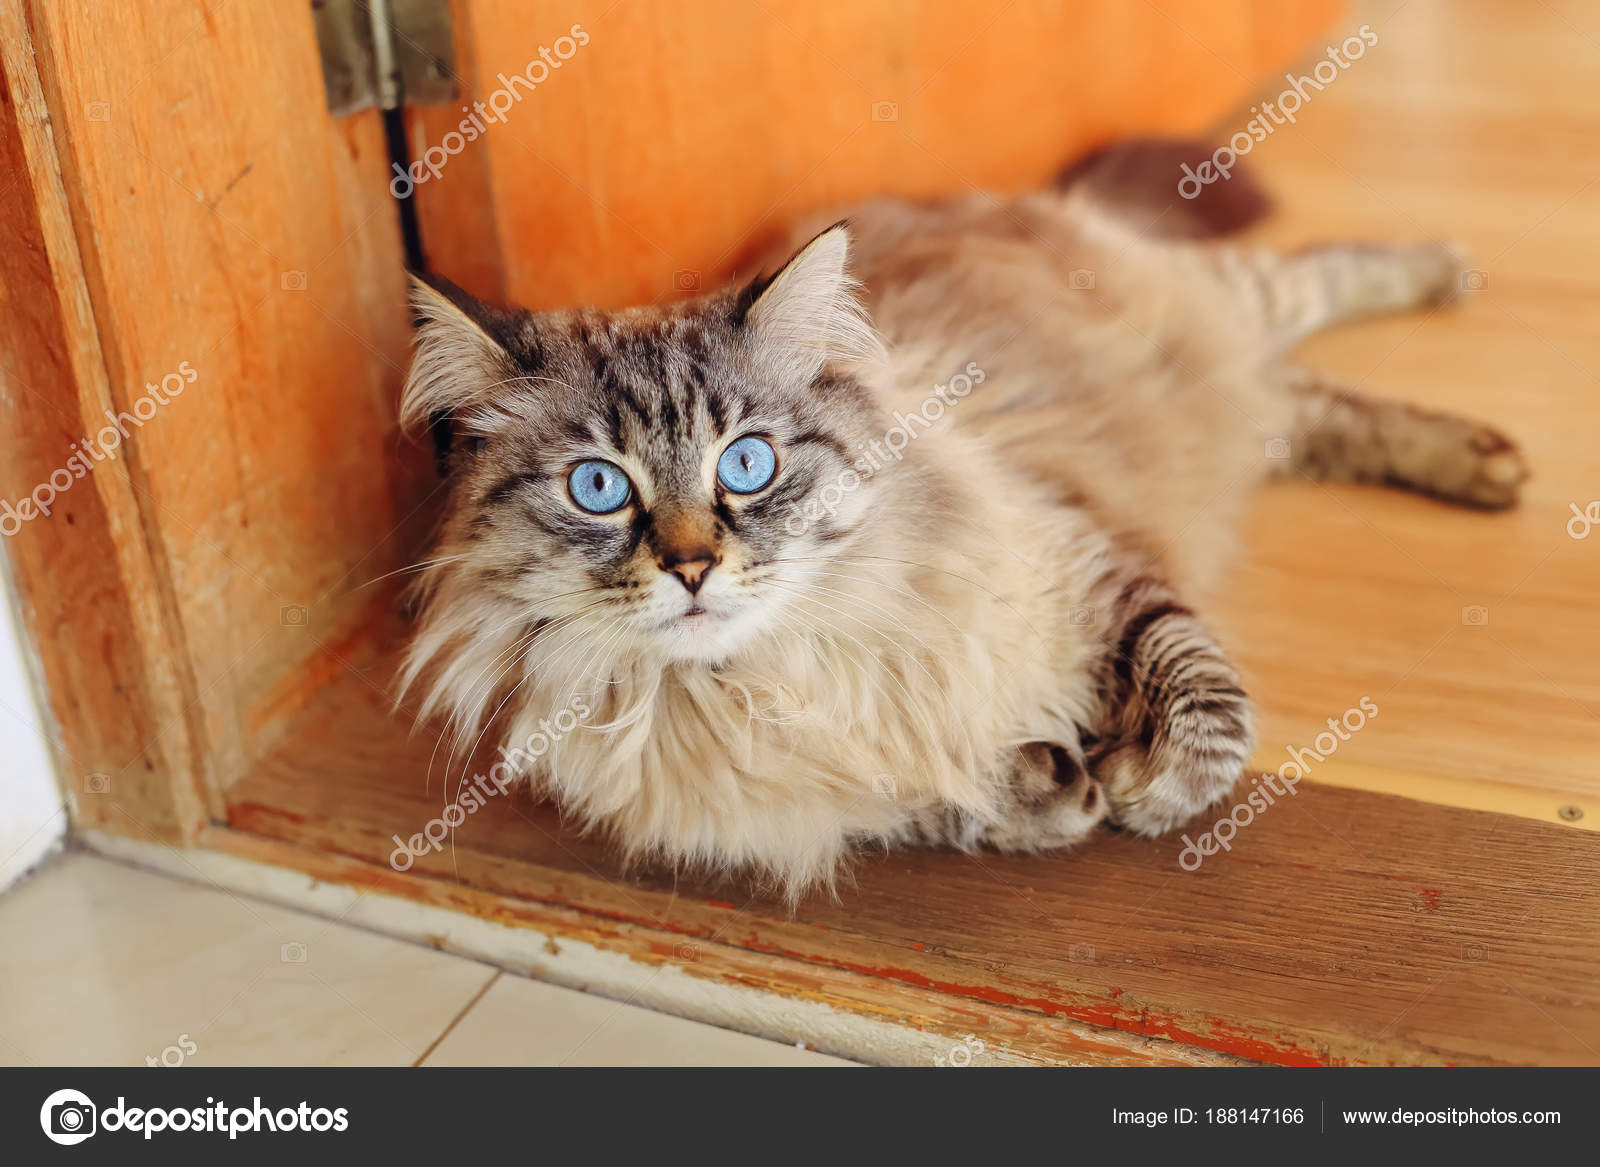 9b8b1dcfb8 Gato Está Acostado Puerta Mira Lente Cámara — Foto de stock ...